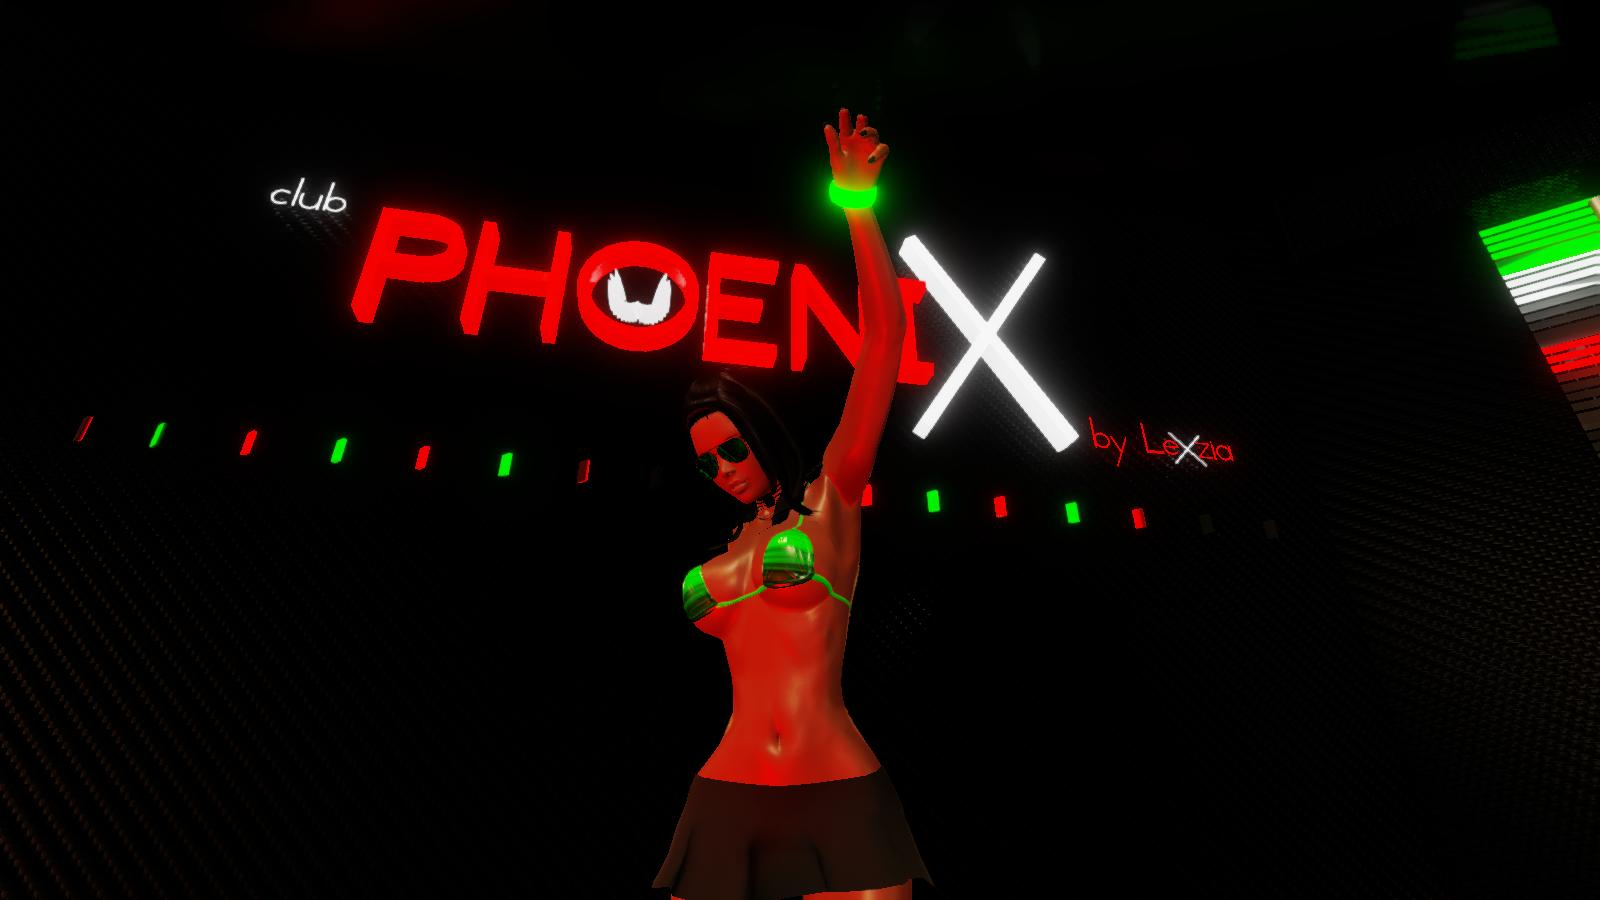 Club Phoenix 05